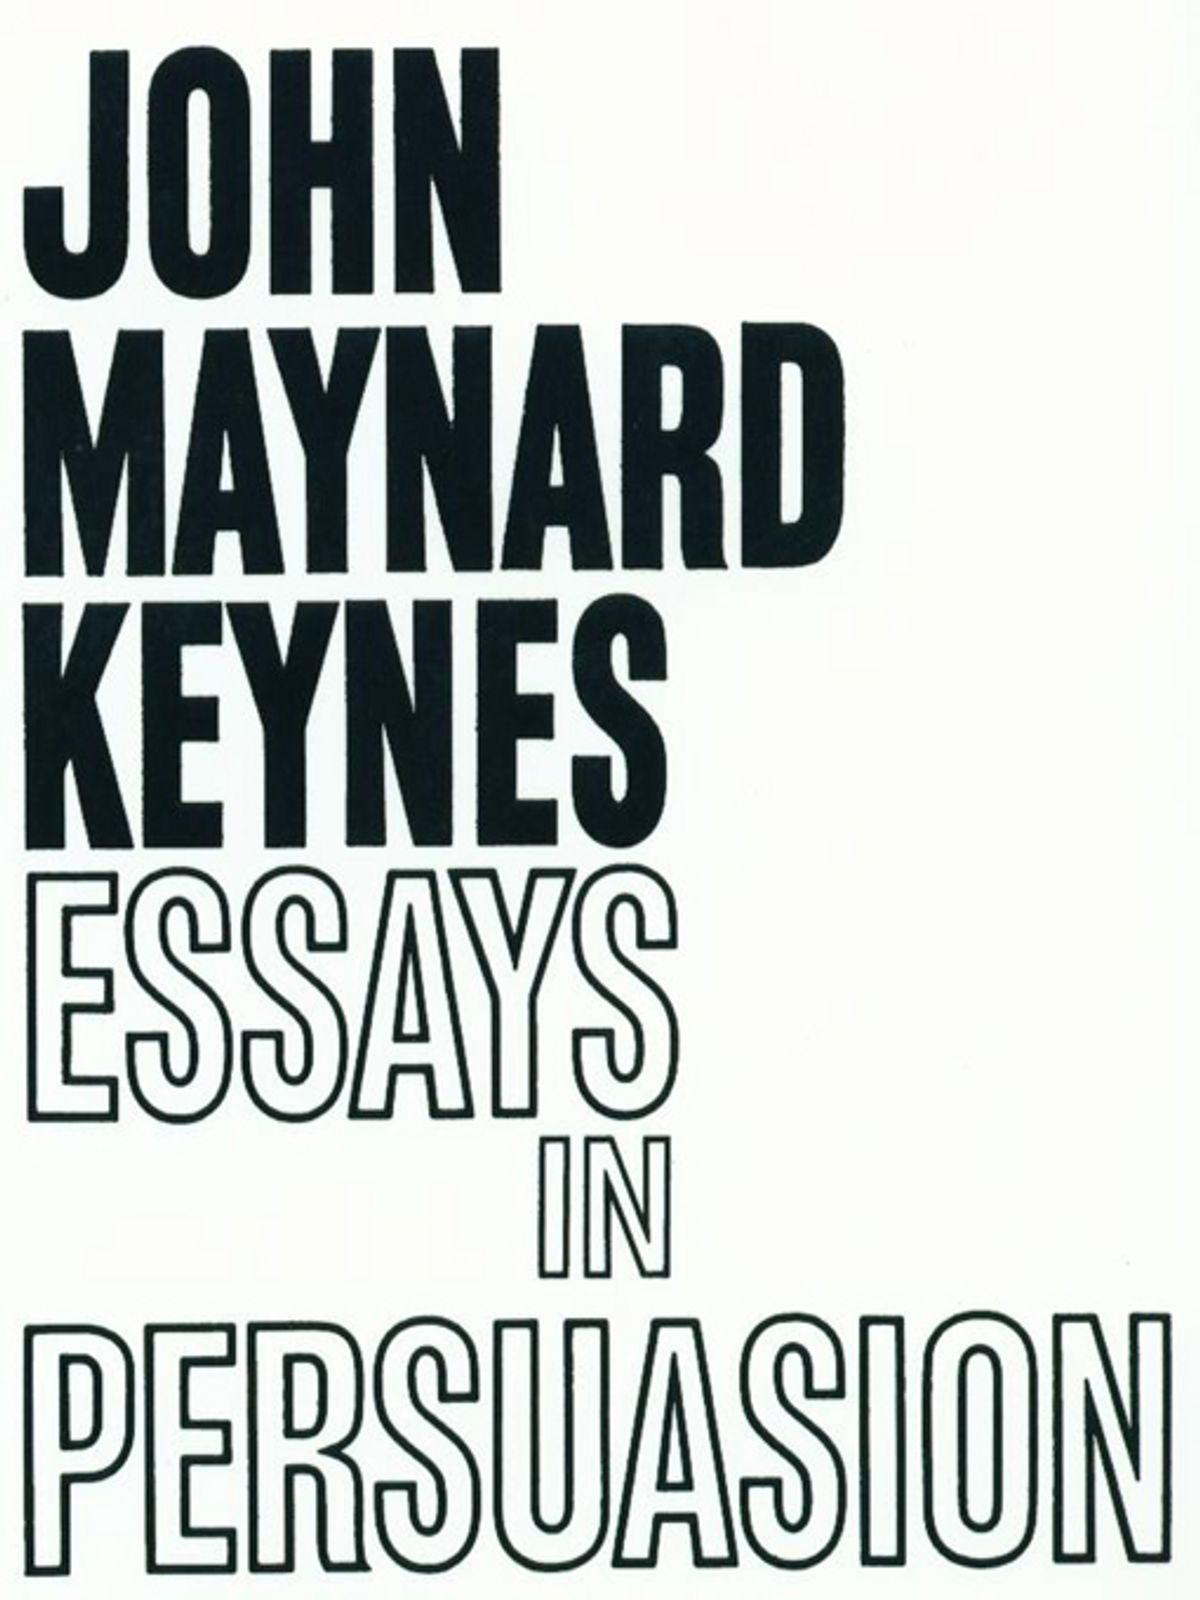 012 Essays In Persuasion Essay Remarkable Audiobook Pdf John Maynard Keynes Summary Full